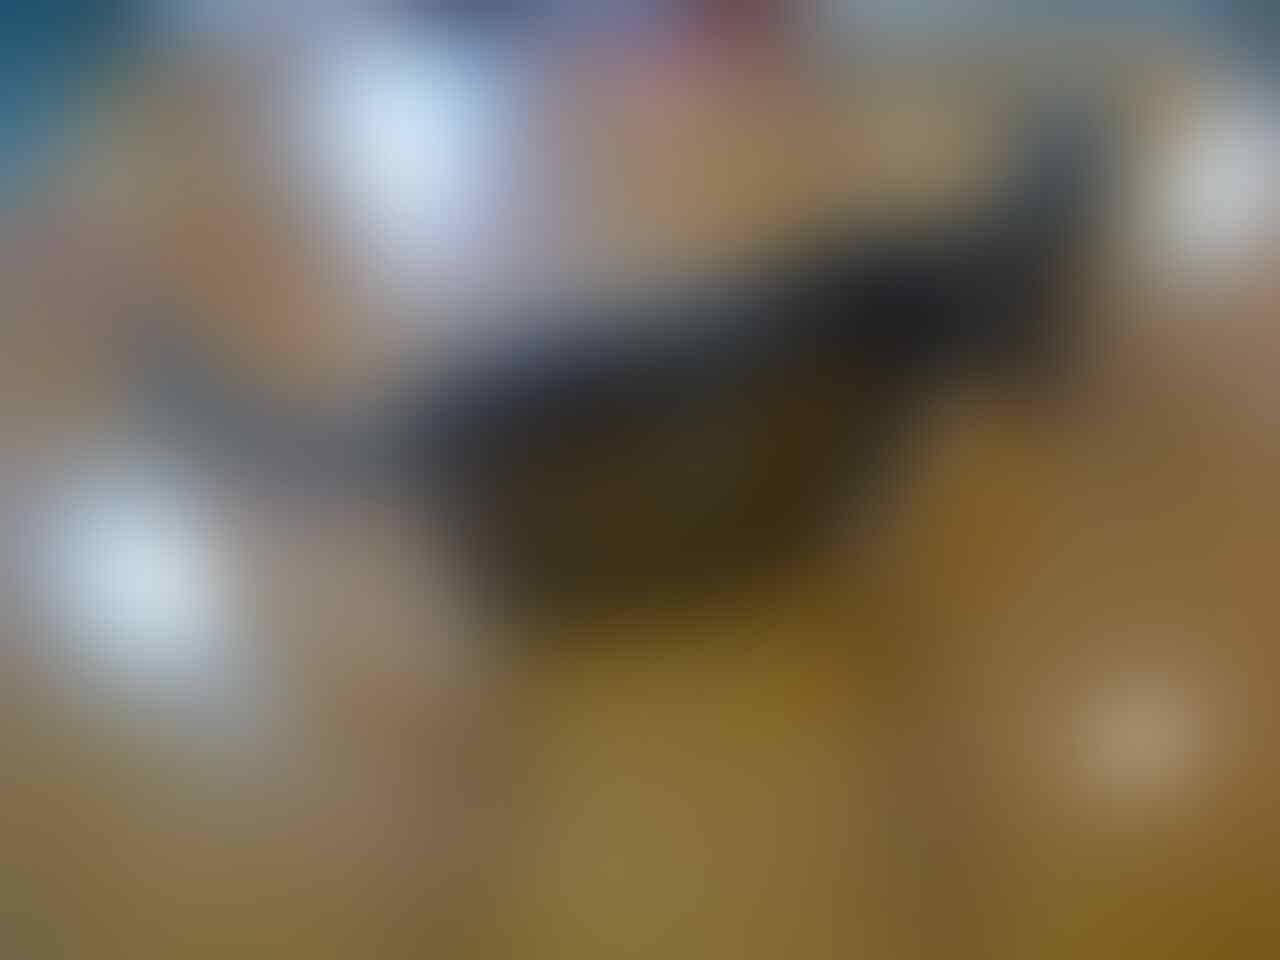 3f74bcb281 Terjual Kacamata Oakley Replika Super Premium dll   No TIPU